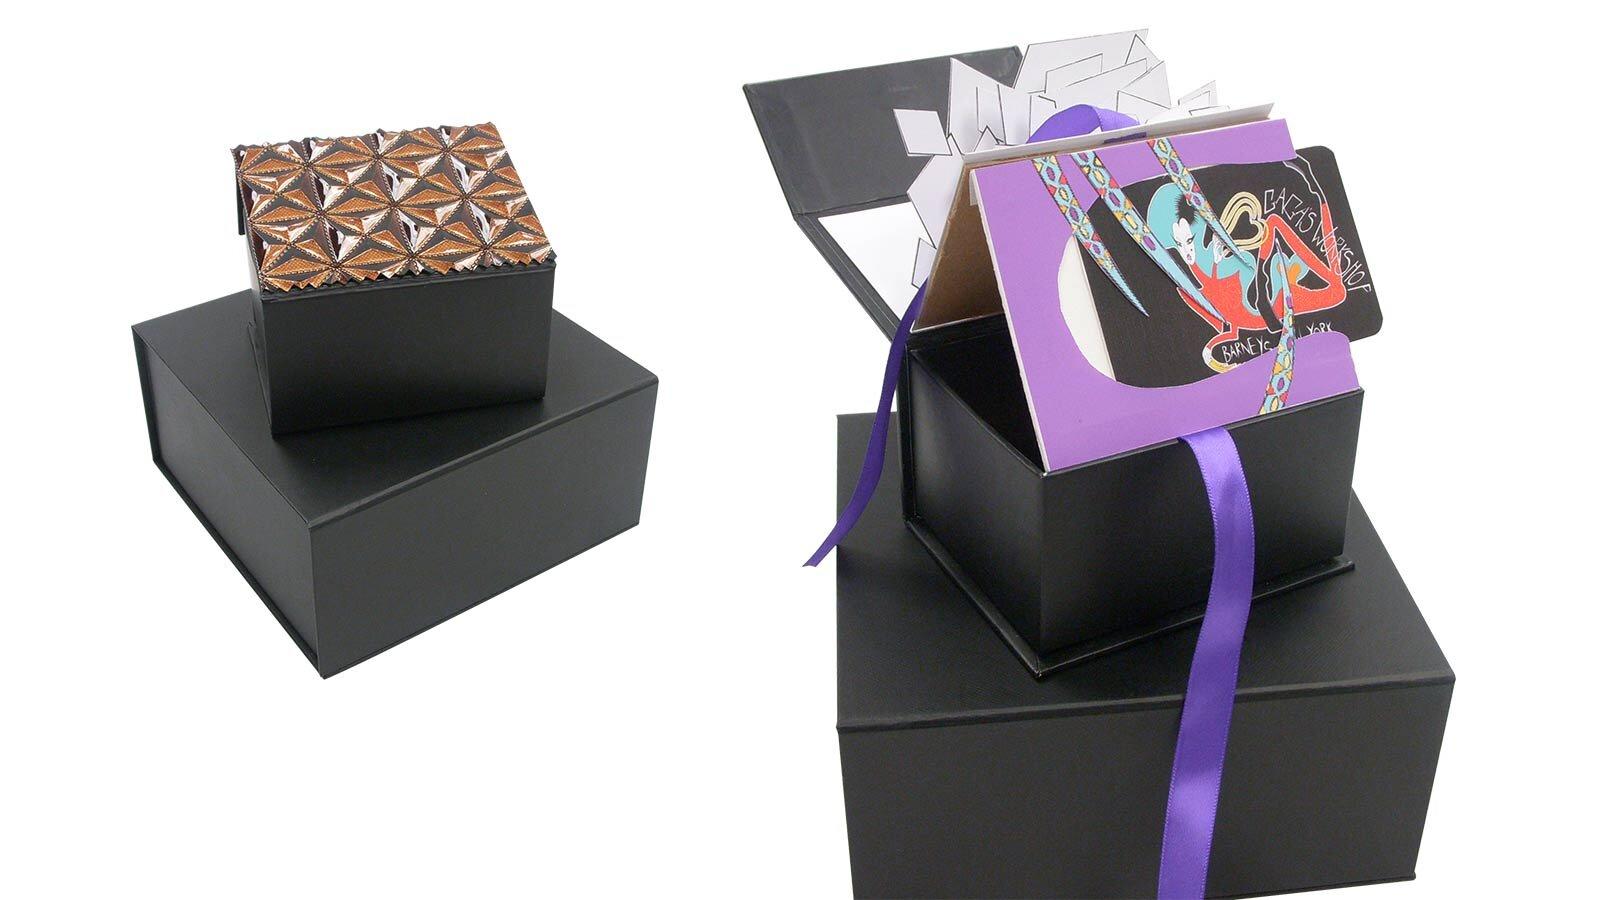 Barneys-New-York-Lady-Gaga-Design-Packaging-3.1.jpg